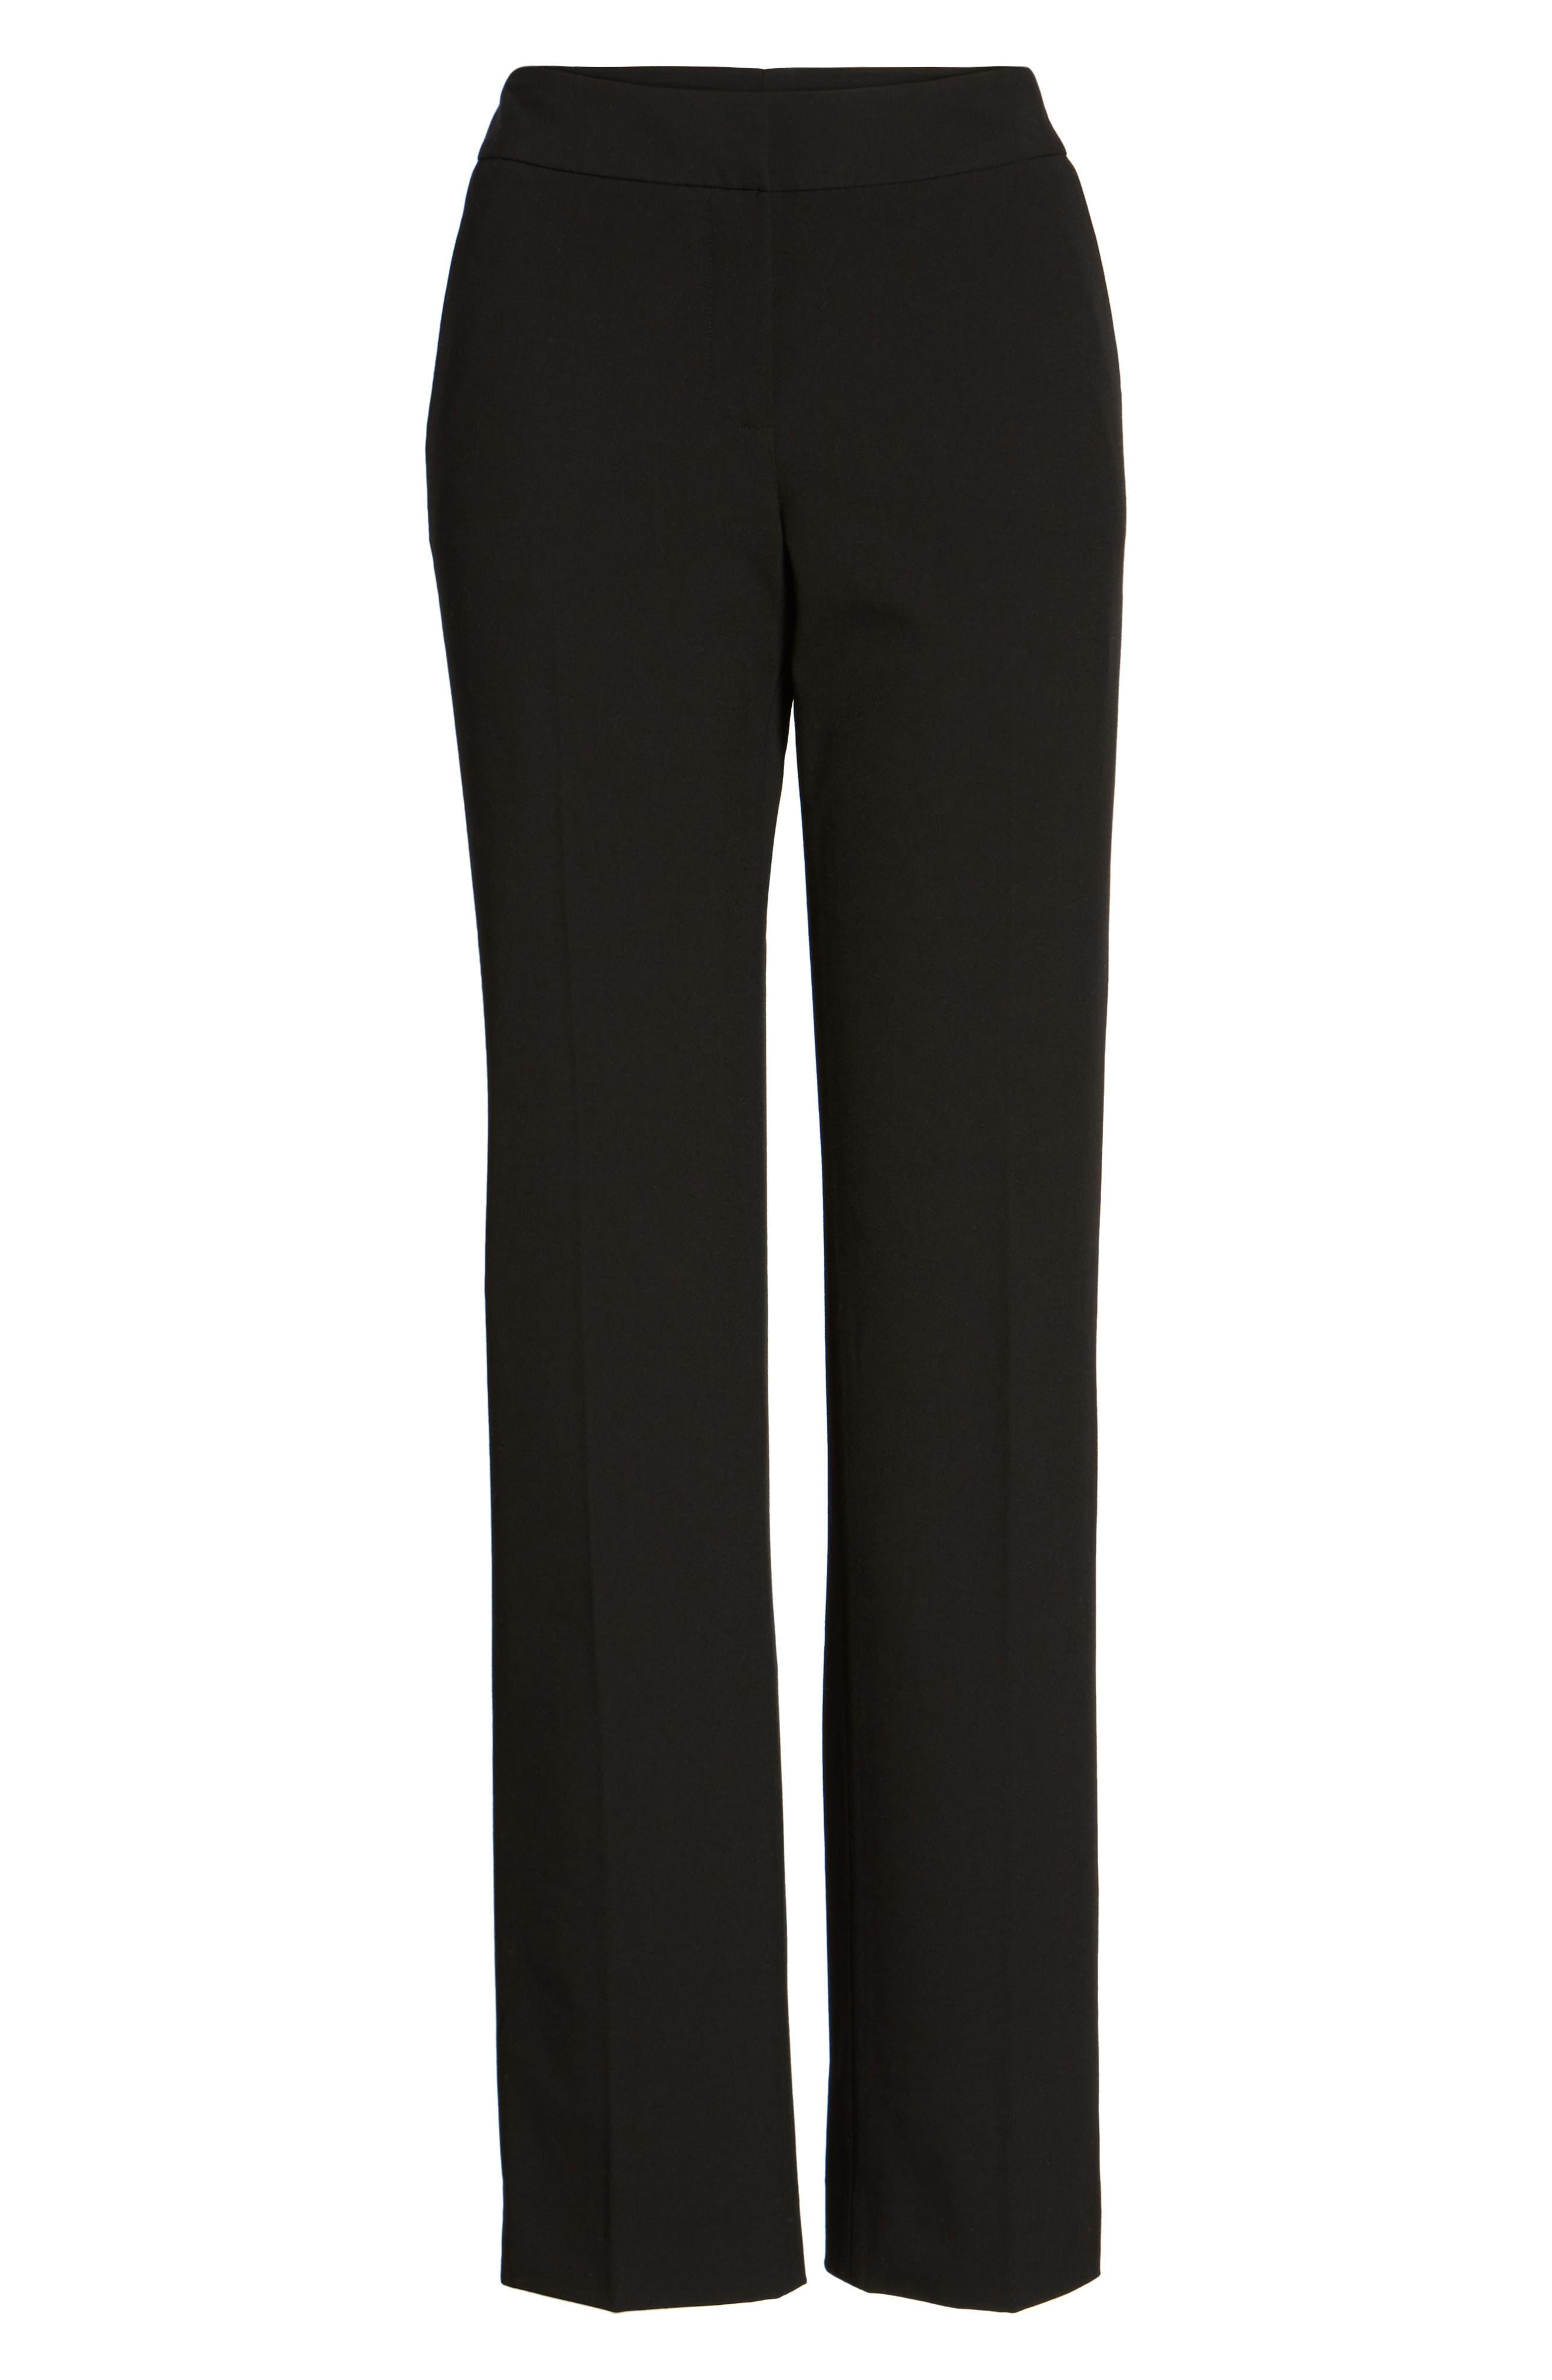 Stovepipe Pants,                             Alternate thumbnail 6, color,                             Black